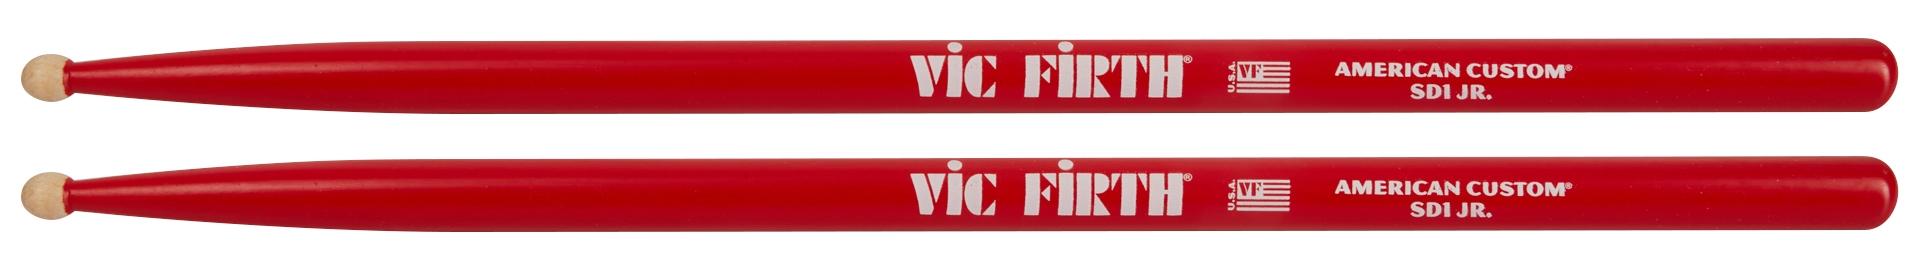 VIC FIRTH SD1 Jr. American Custom®